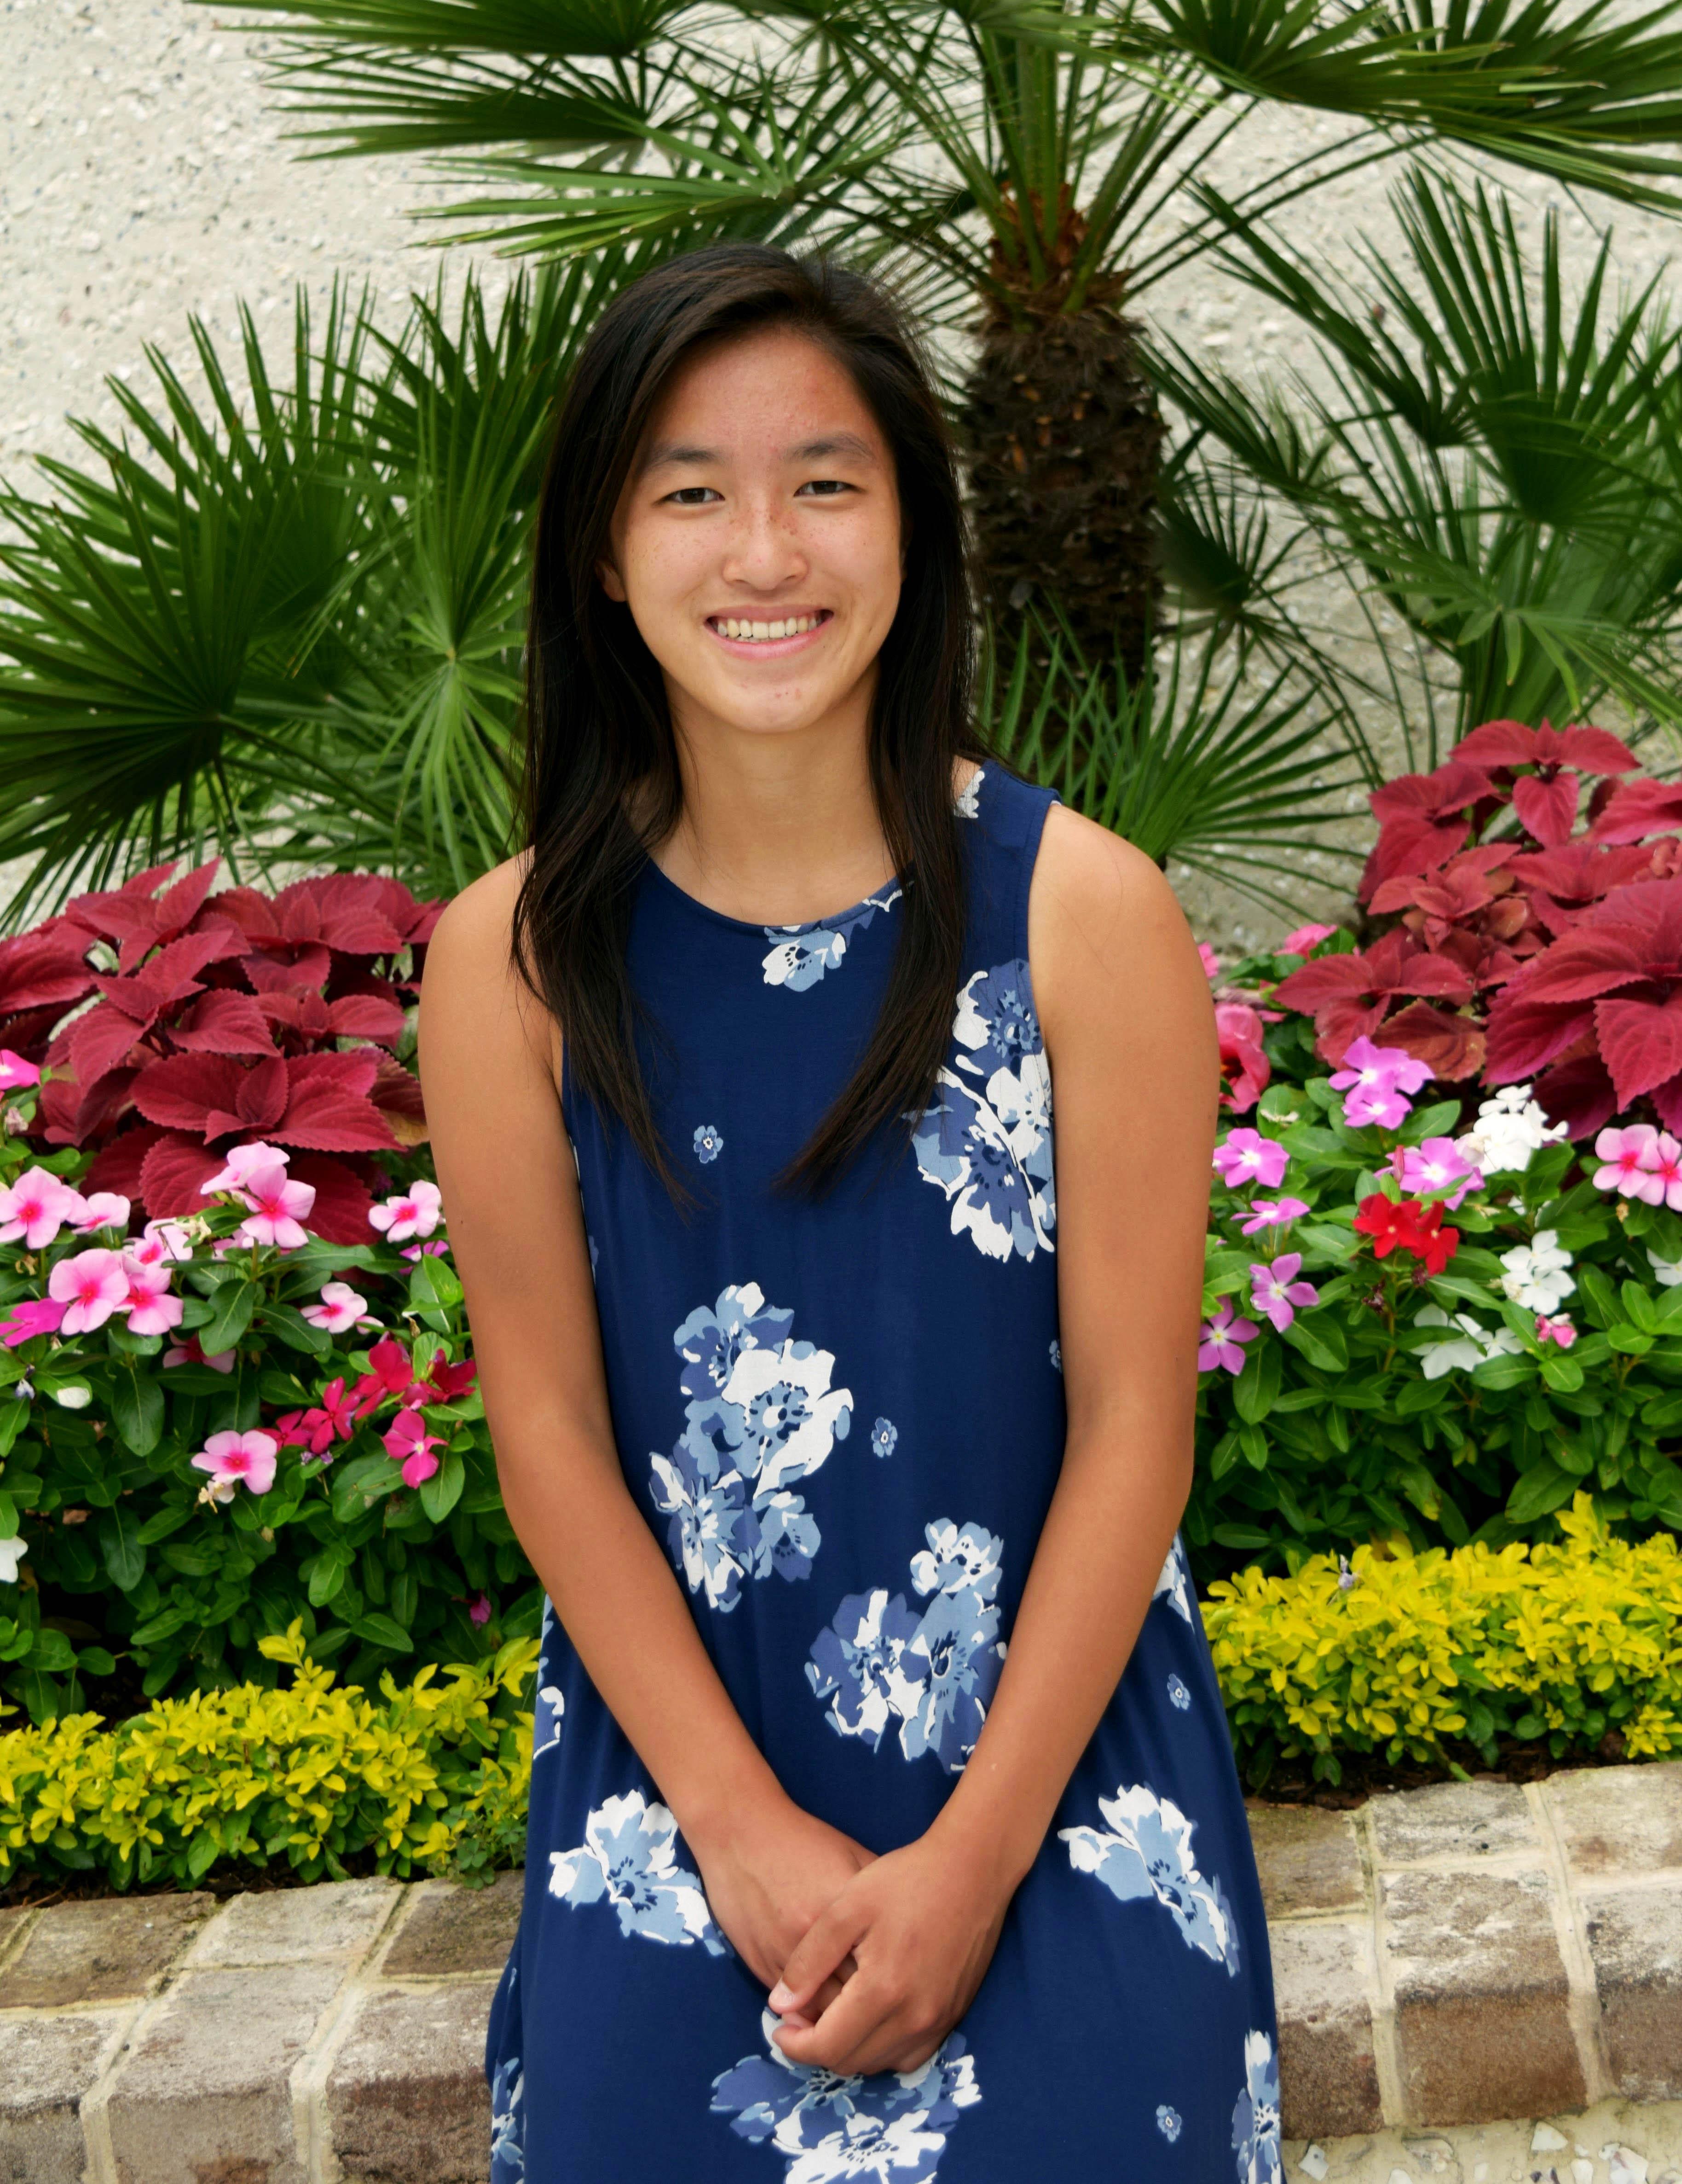 A photos of Morgan Mosco, the Virginia Tech Student Chapter Director of Public Relations